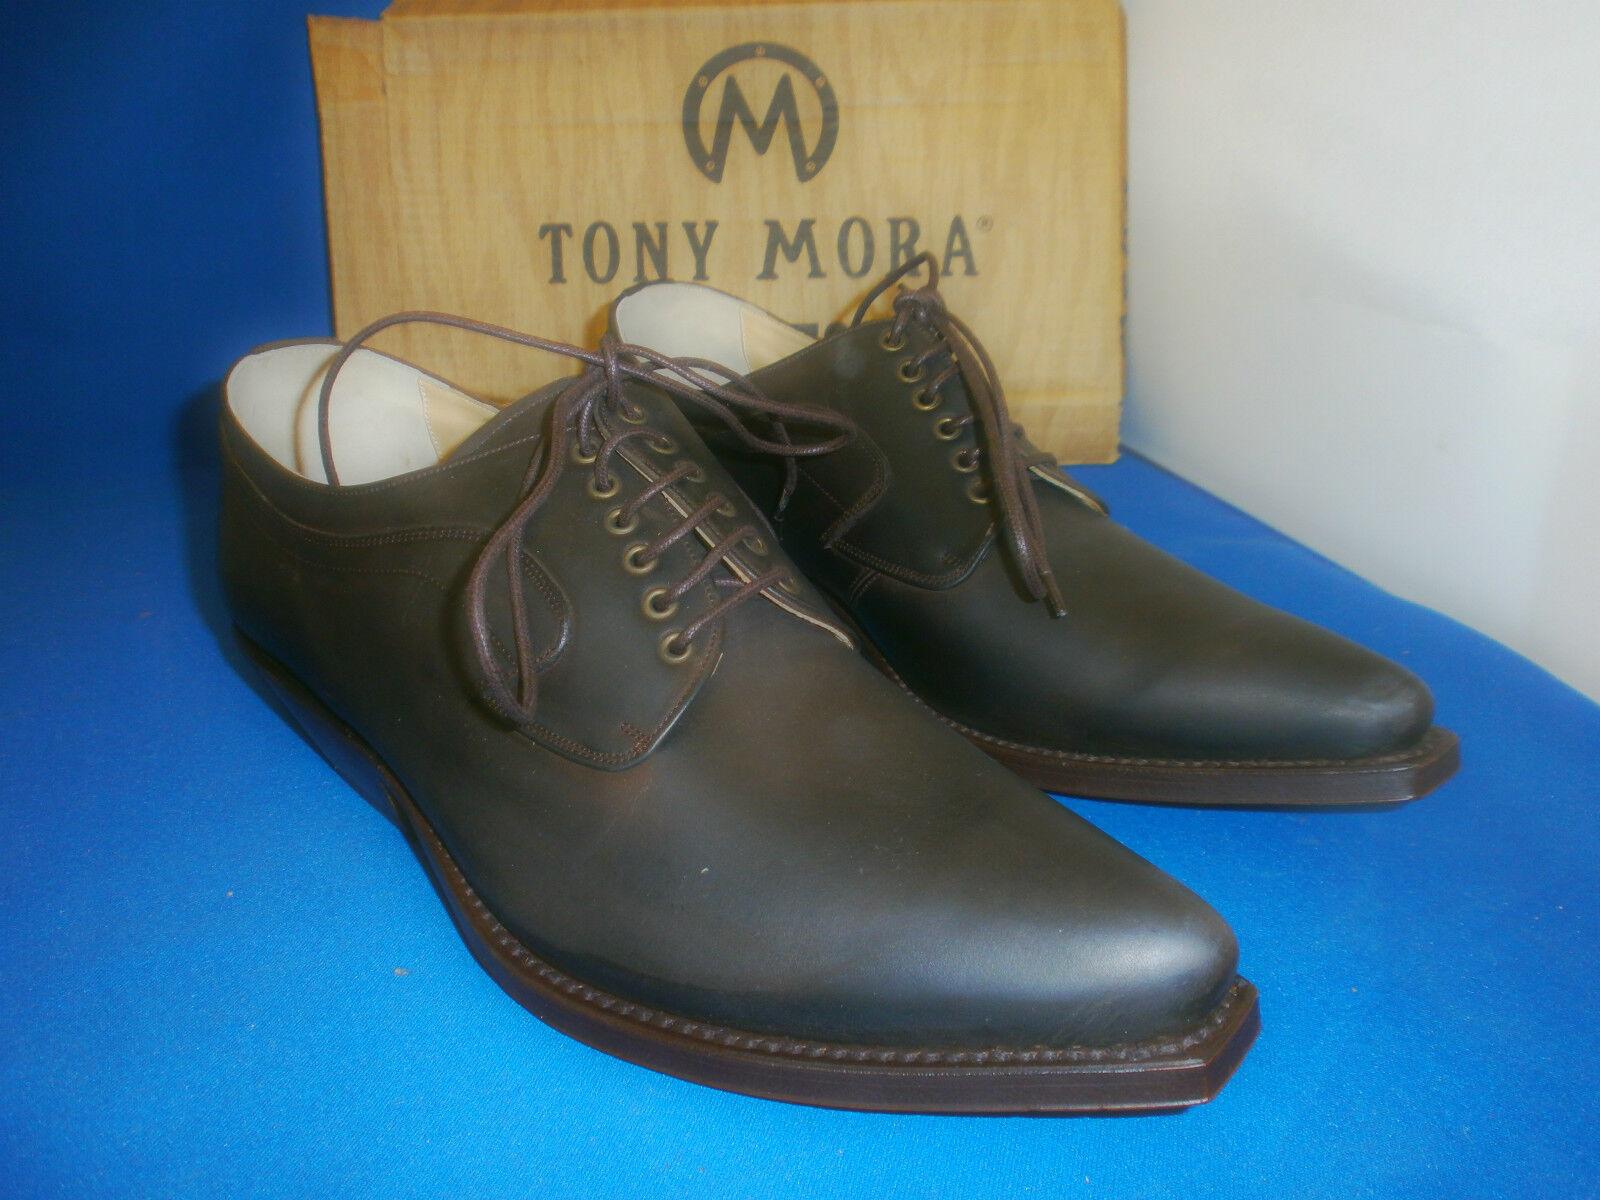 tony mora boots  schuh halbschuh handmade mokka  leder neu  gr. 45